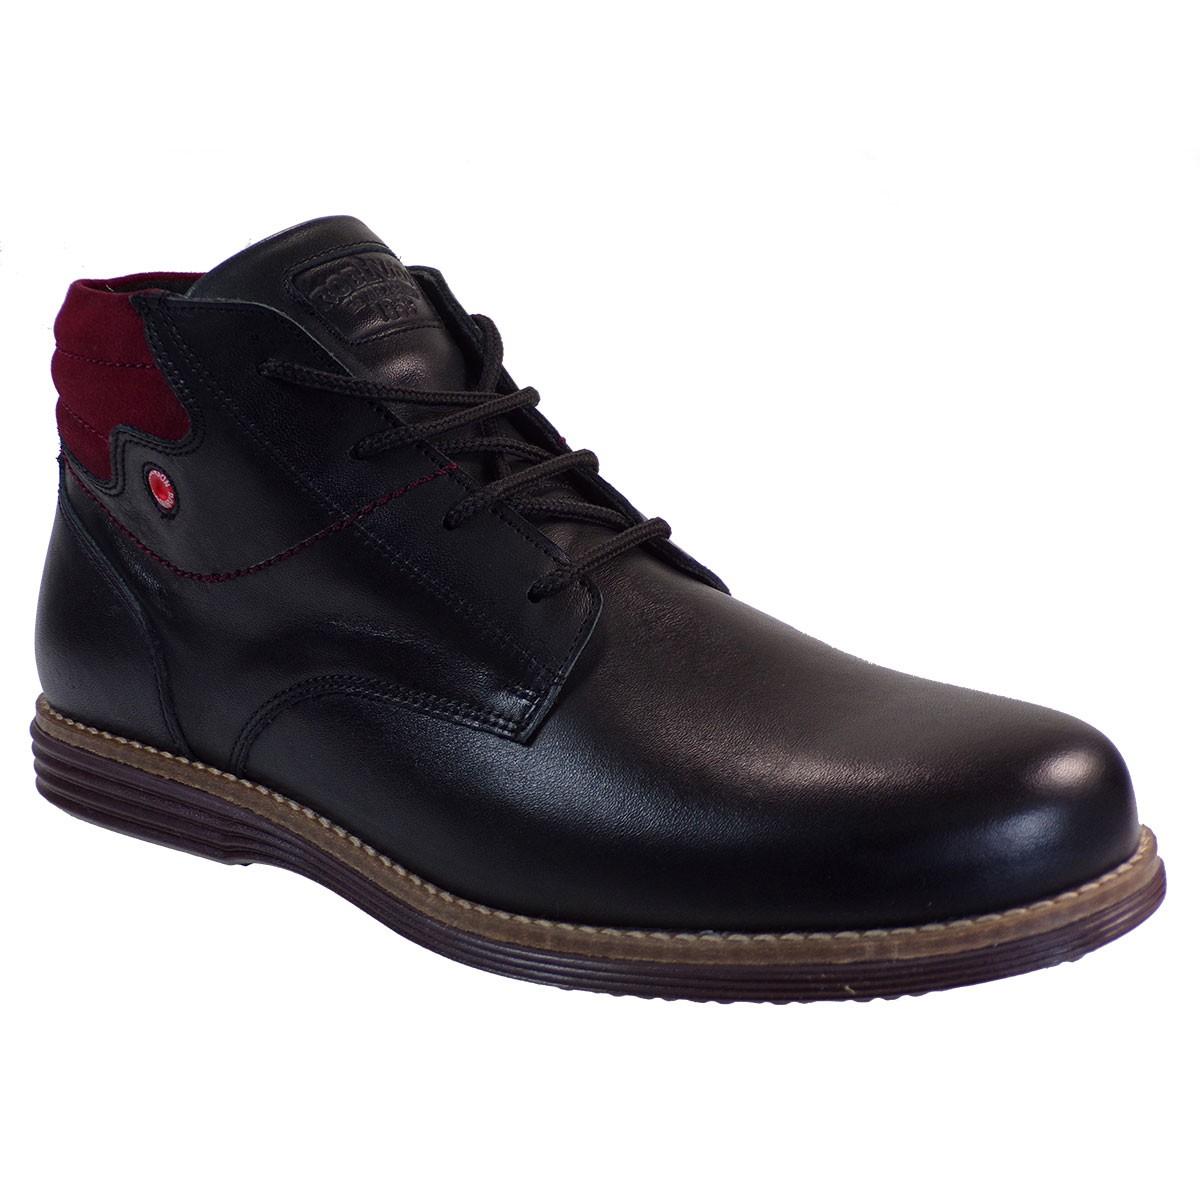 Robinson Ανδρικά Παπούτσια Μποτάκια 2021 Μαύρο Δέρμα